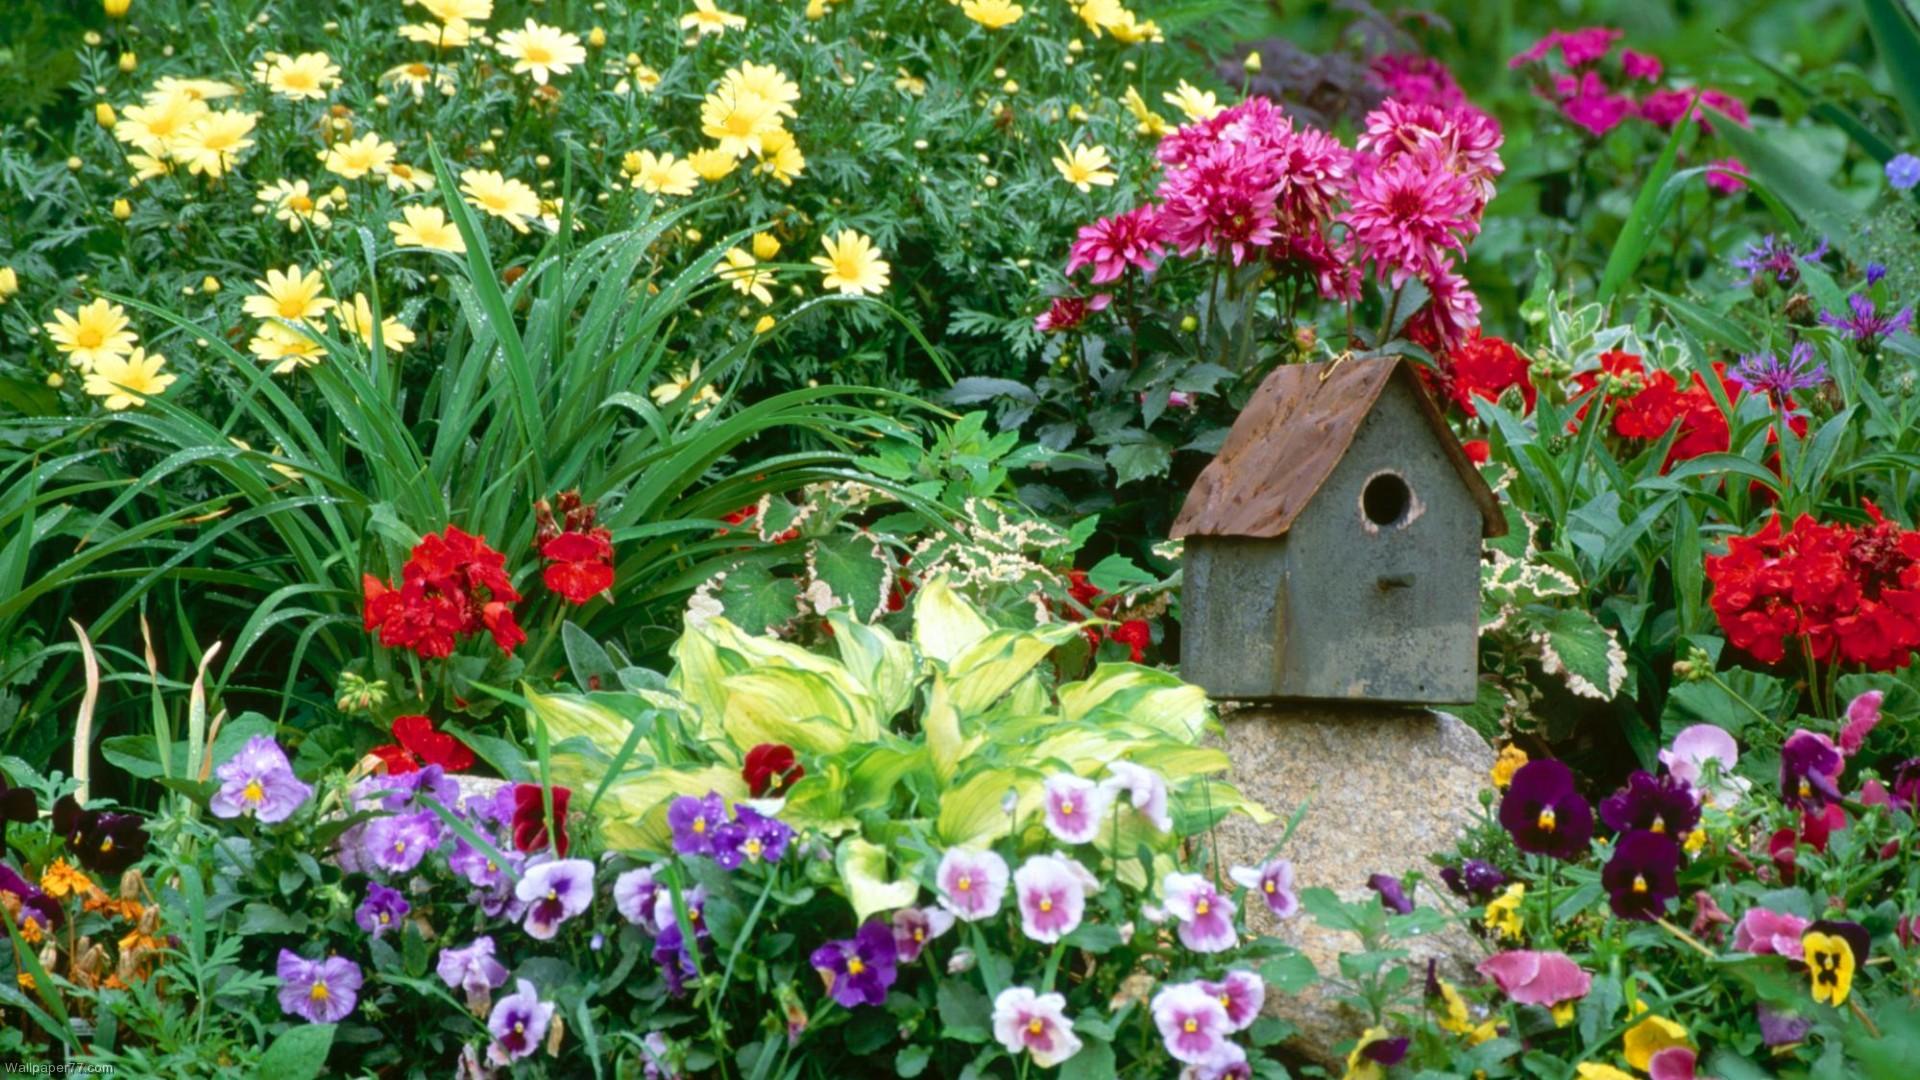 48+] Flower Garden Wallpapers for Desktop on WallpaperSafari